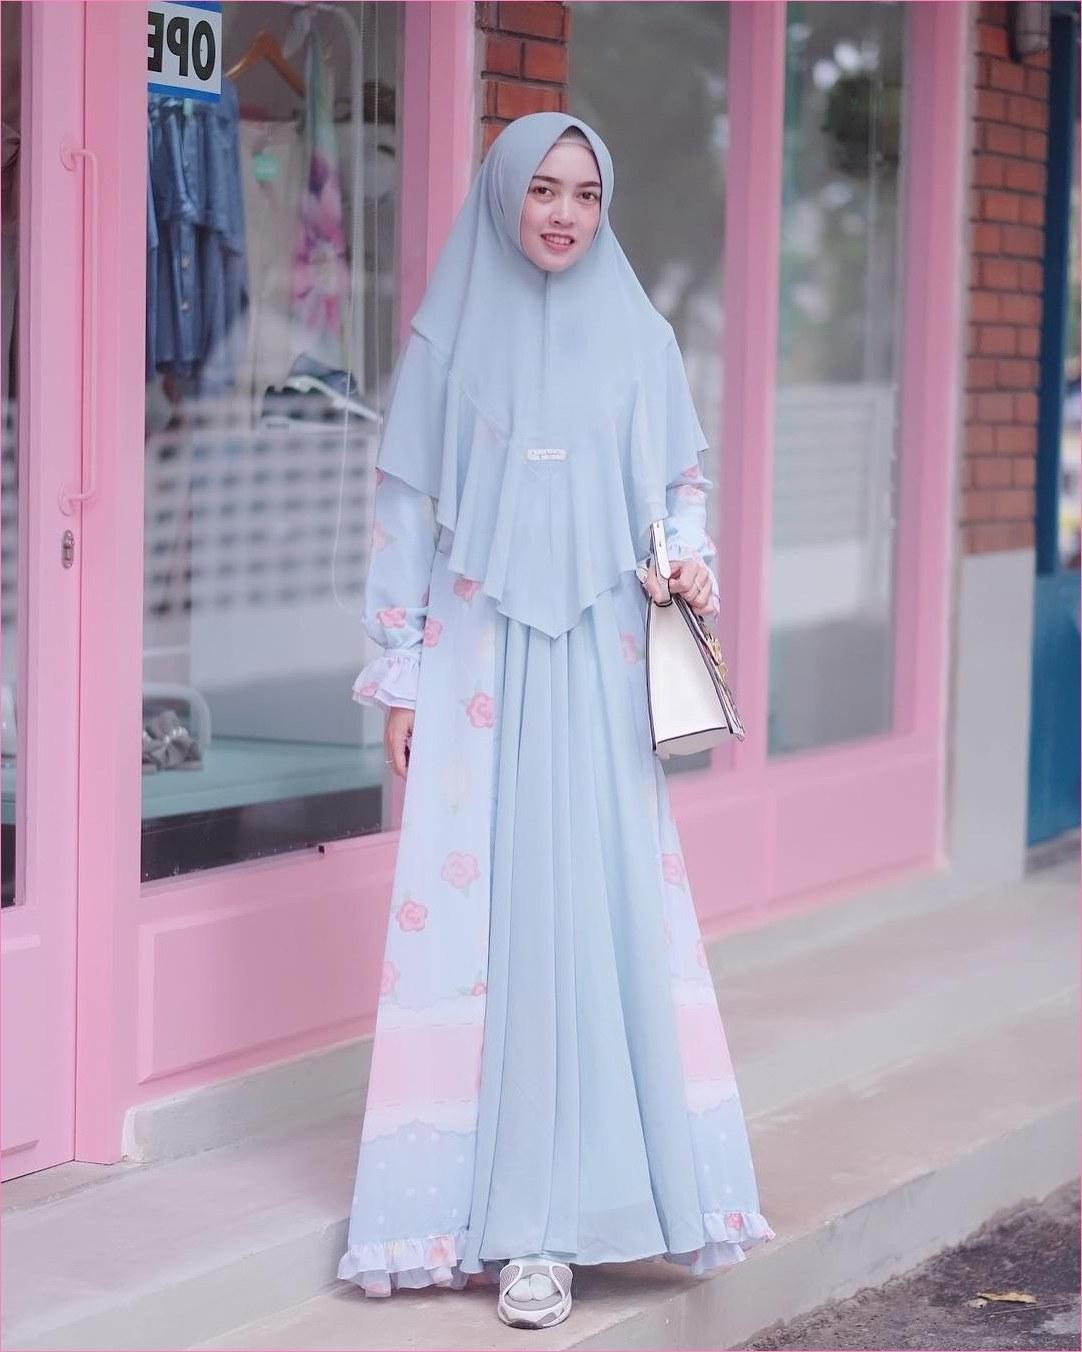 Ide Ootd Baju Lebaran Rldj Outfit Baju Gamis Berhijab Ala Selebgram 2018